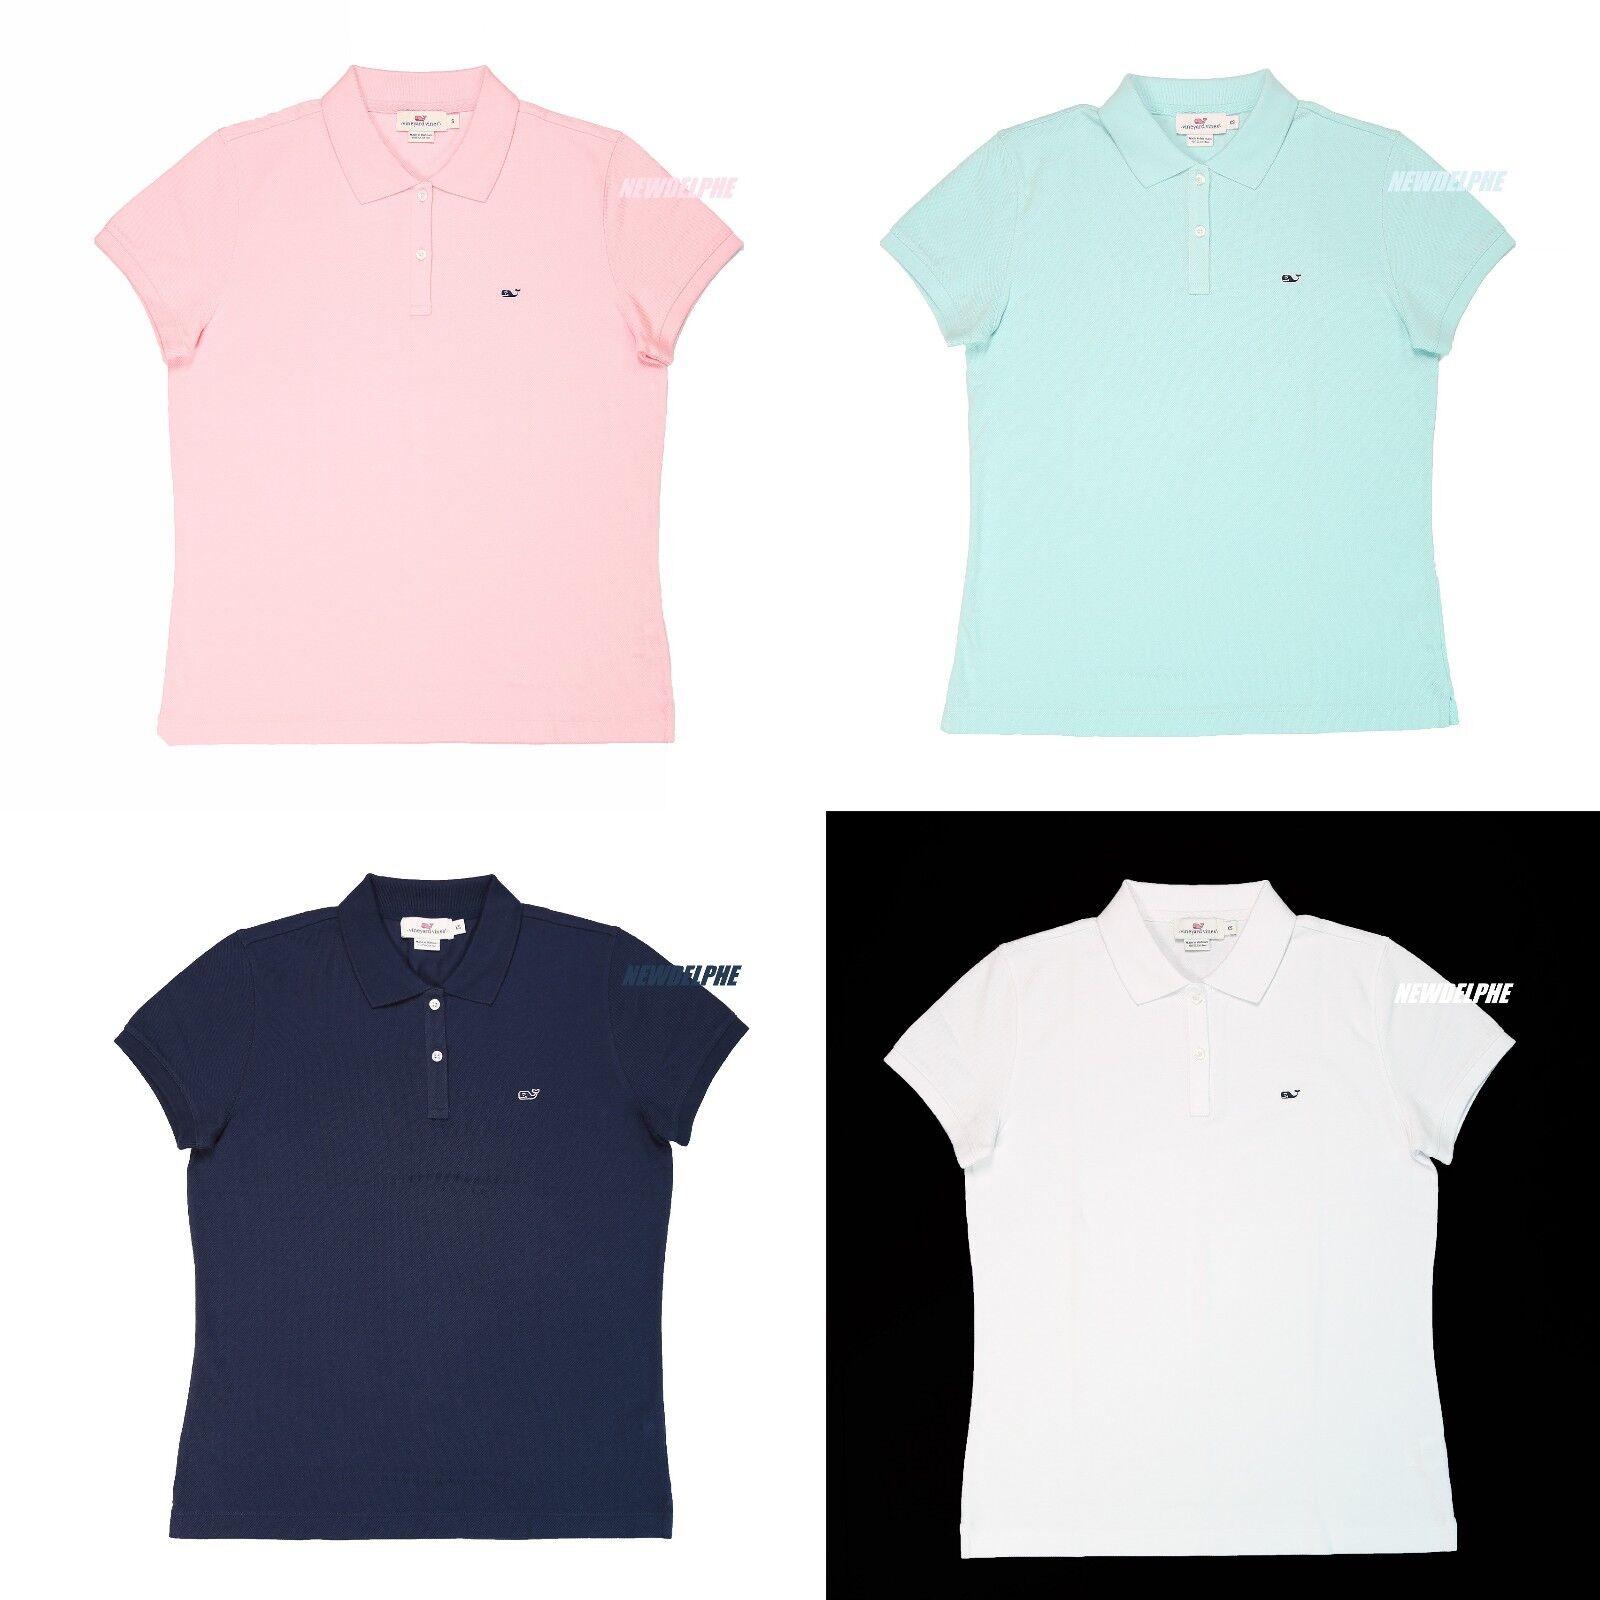 NWT Vineyard Vines Woherren Polo Shirt Whale Logo Classic-Fit XS S M L XL